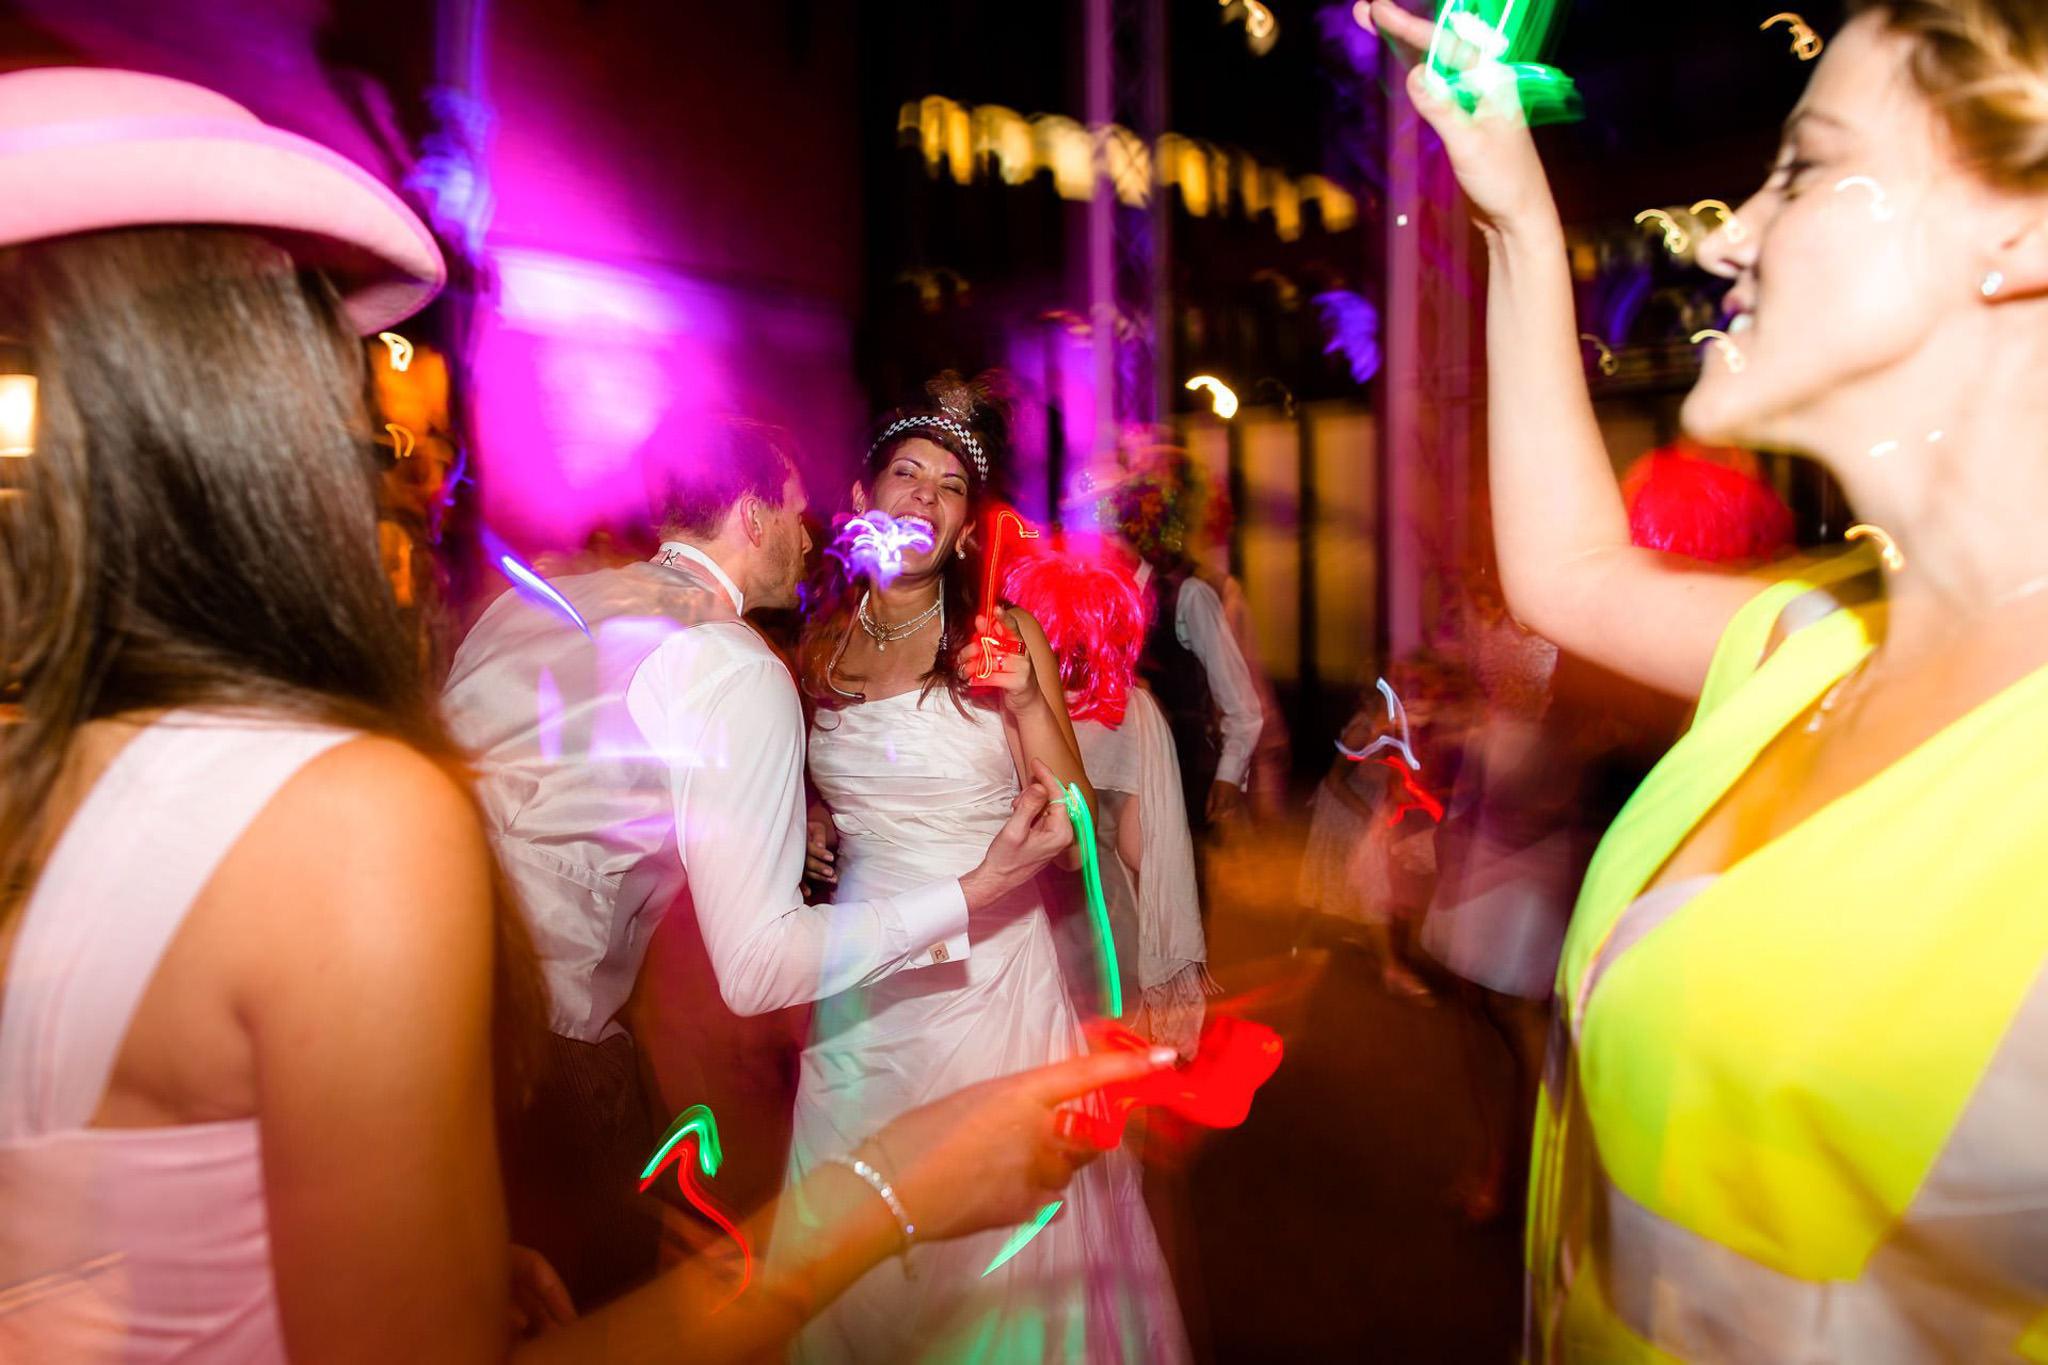 St. Pancras hotel wedding fancy dress party